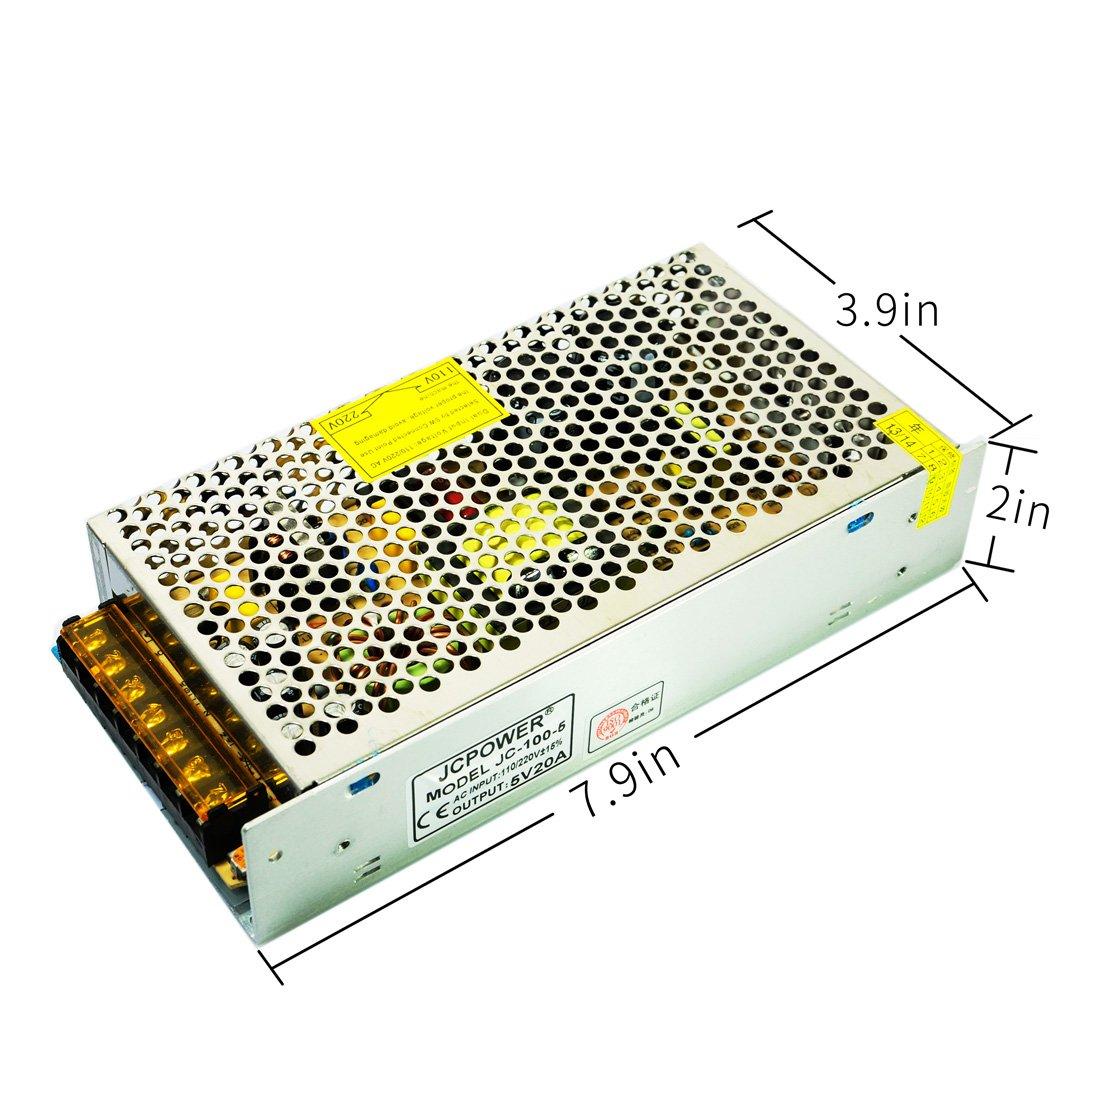 BTF-LIGHTING DC5V 60A 300W Aluminium Netzteil für WS2812B APA102 LED8806 WS2801 SK6813 LED-Streifenmodule Licht BTF-LIGHTING Teachnology Co. Limited A5V60A